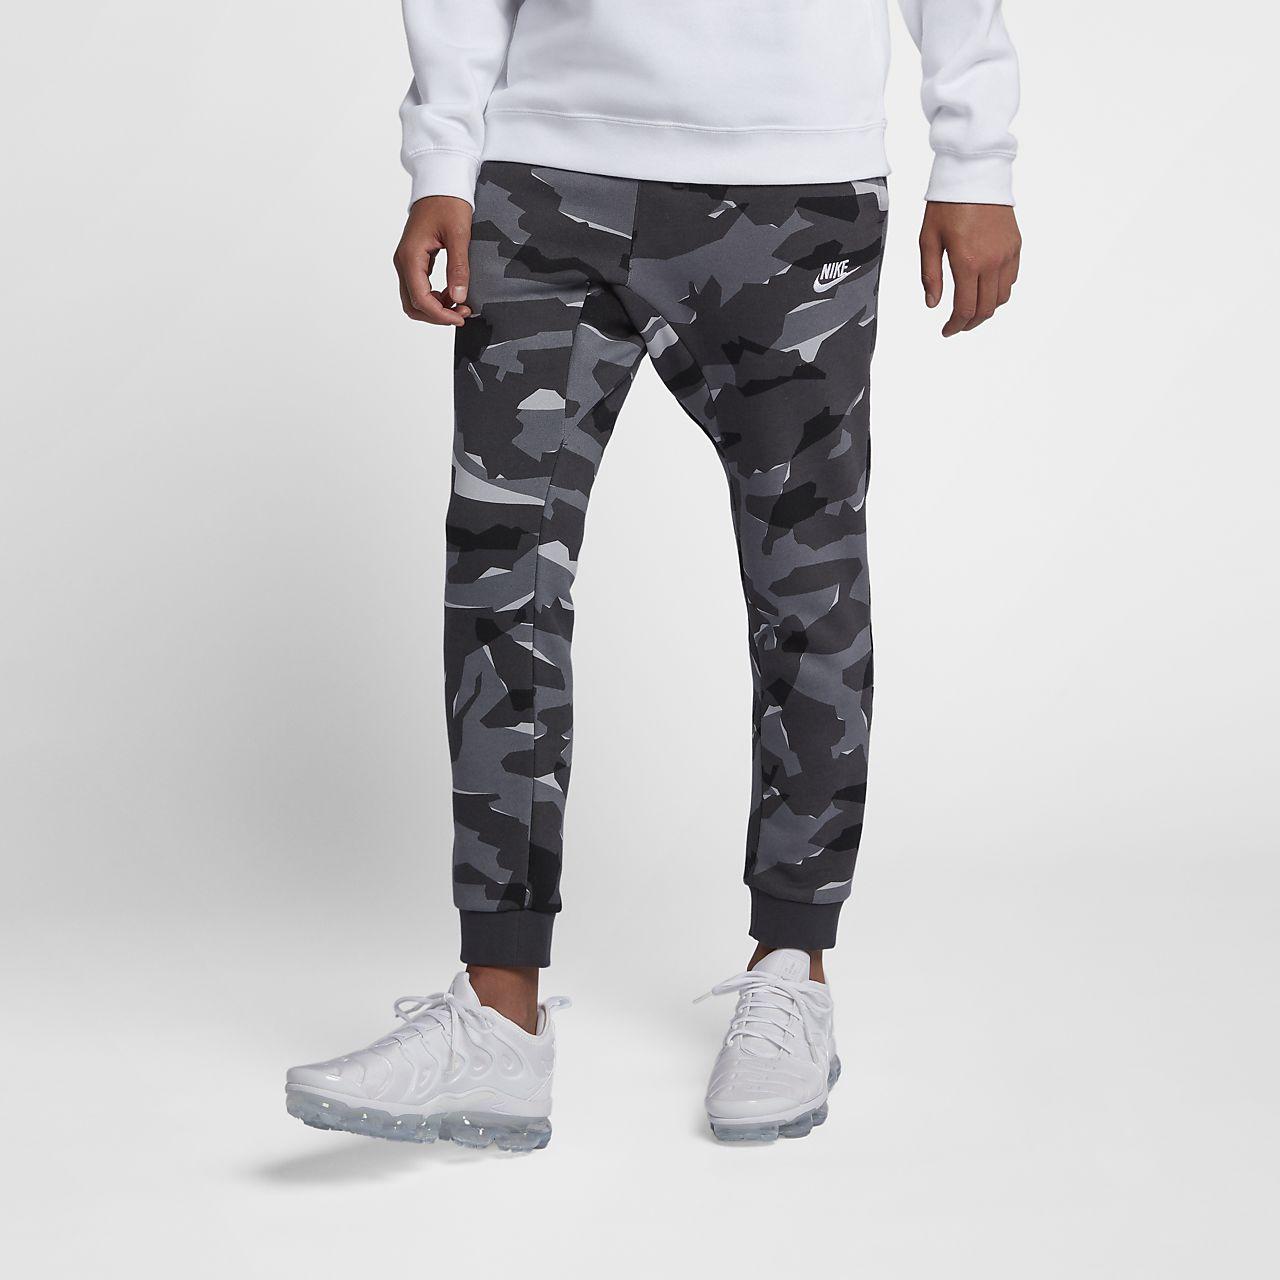 e4f34f69ab40 Pantalon de jogging camouflage Nike Sportswear Club pour Homme. Nike ...